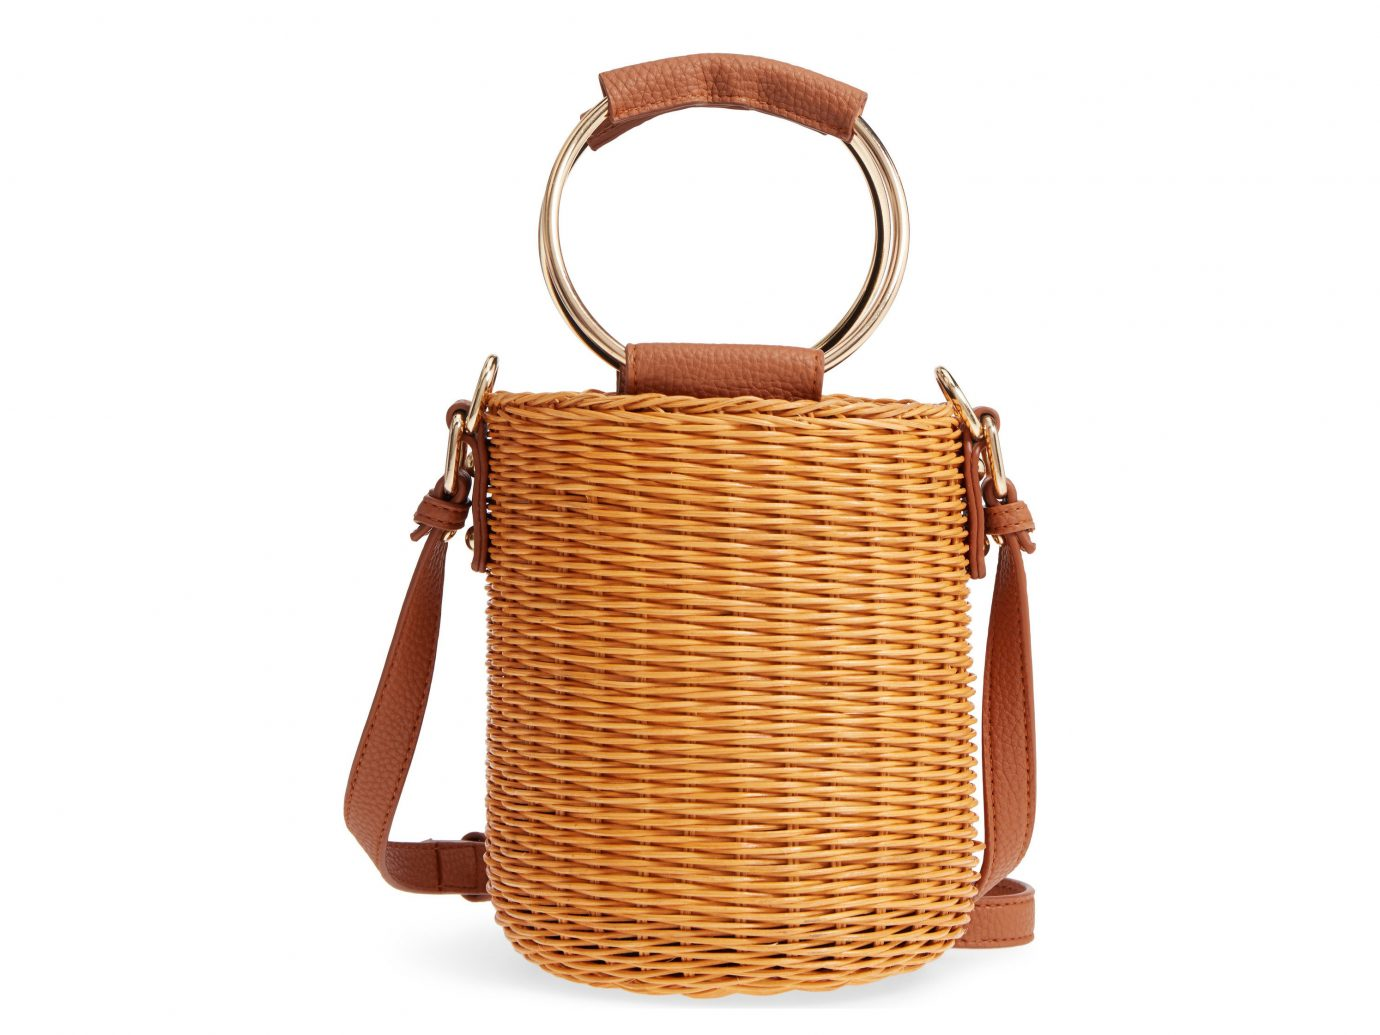 Packing Tips Style + Design Travel Shop basket chair bag indoor handbag shoulder bag container product leather product design wicker